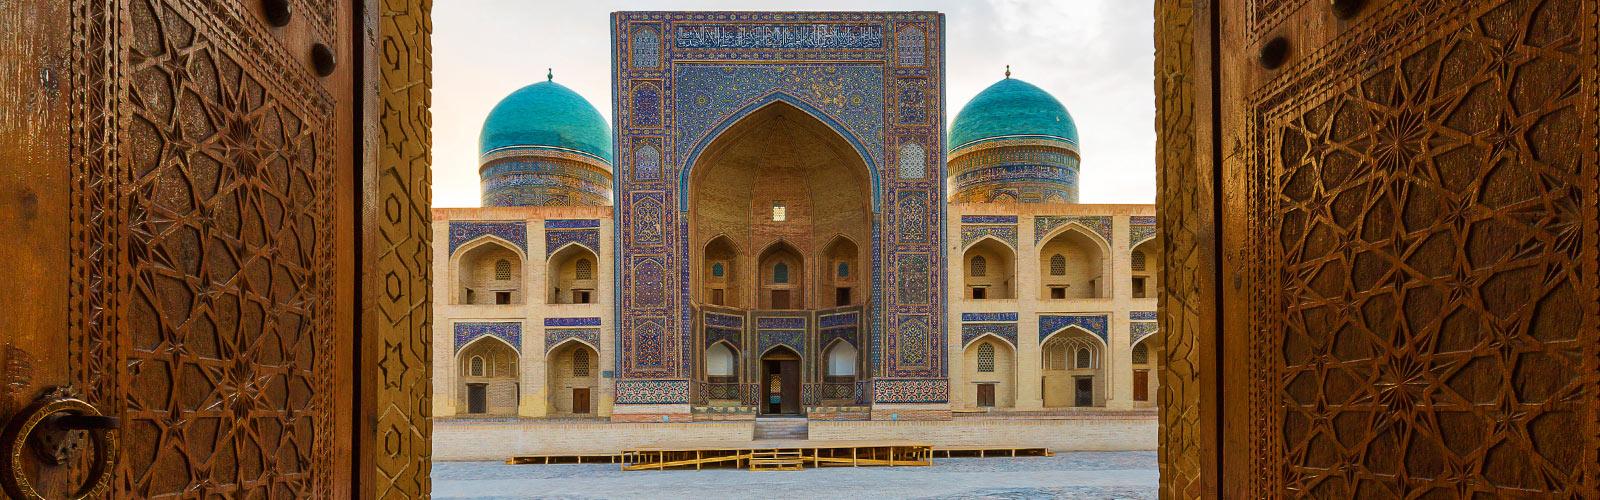 Uzbekistán, Samarcanda y el Valle de Fergana